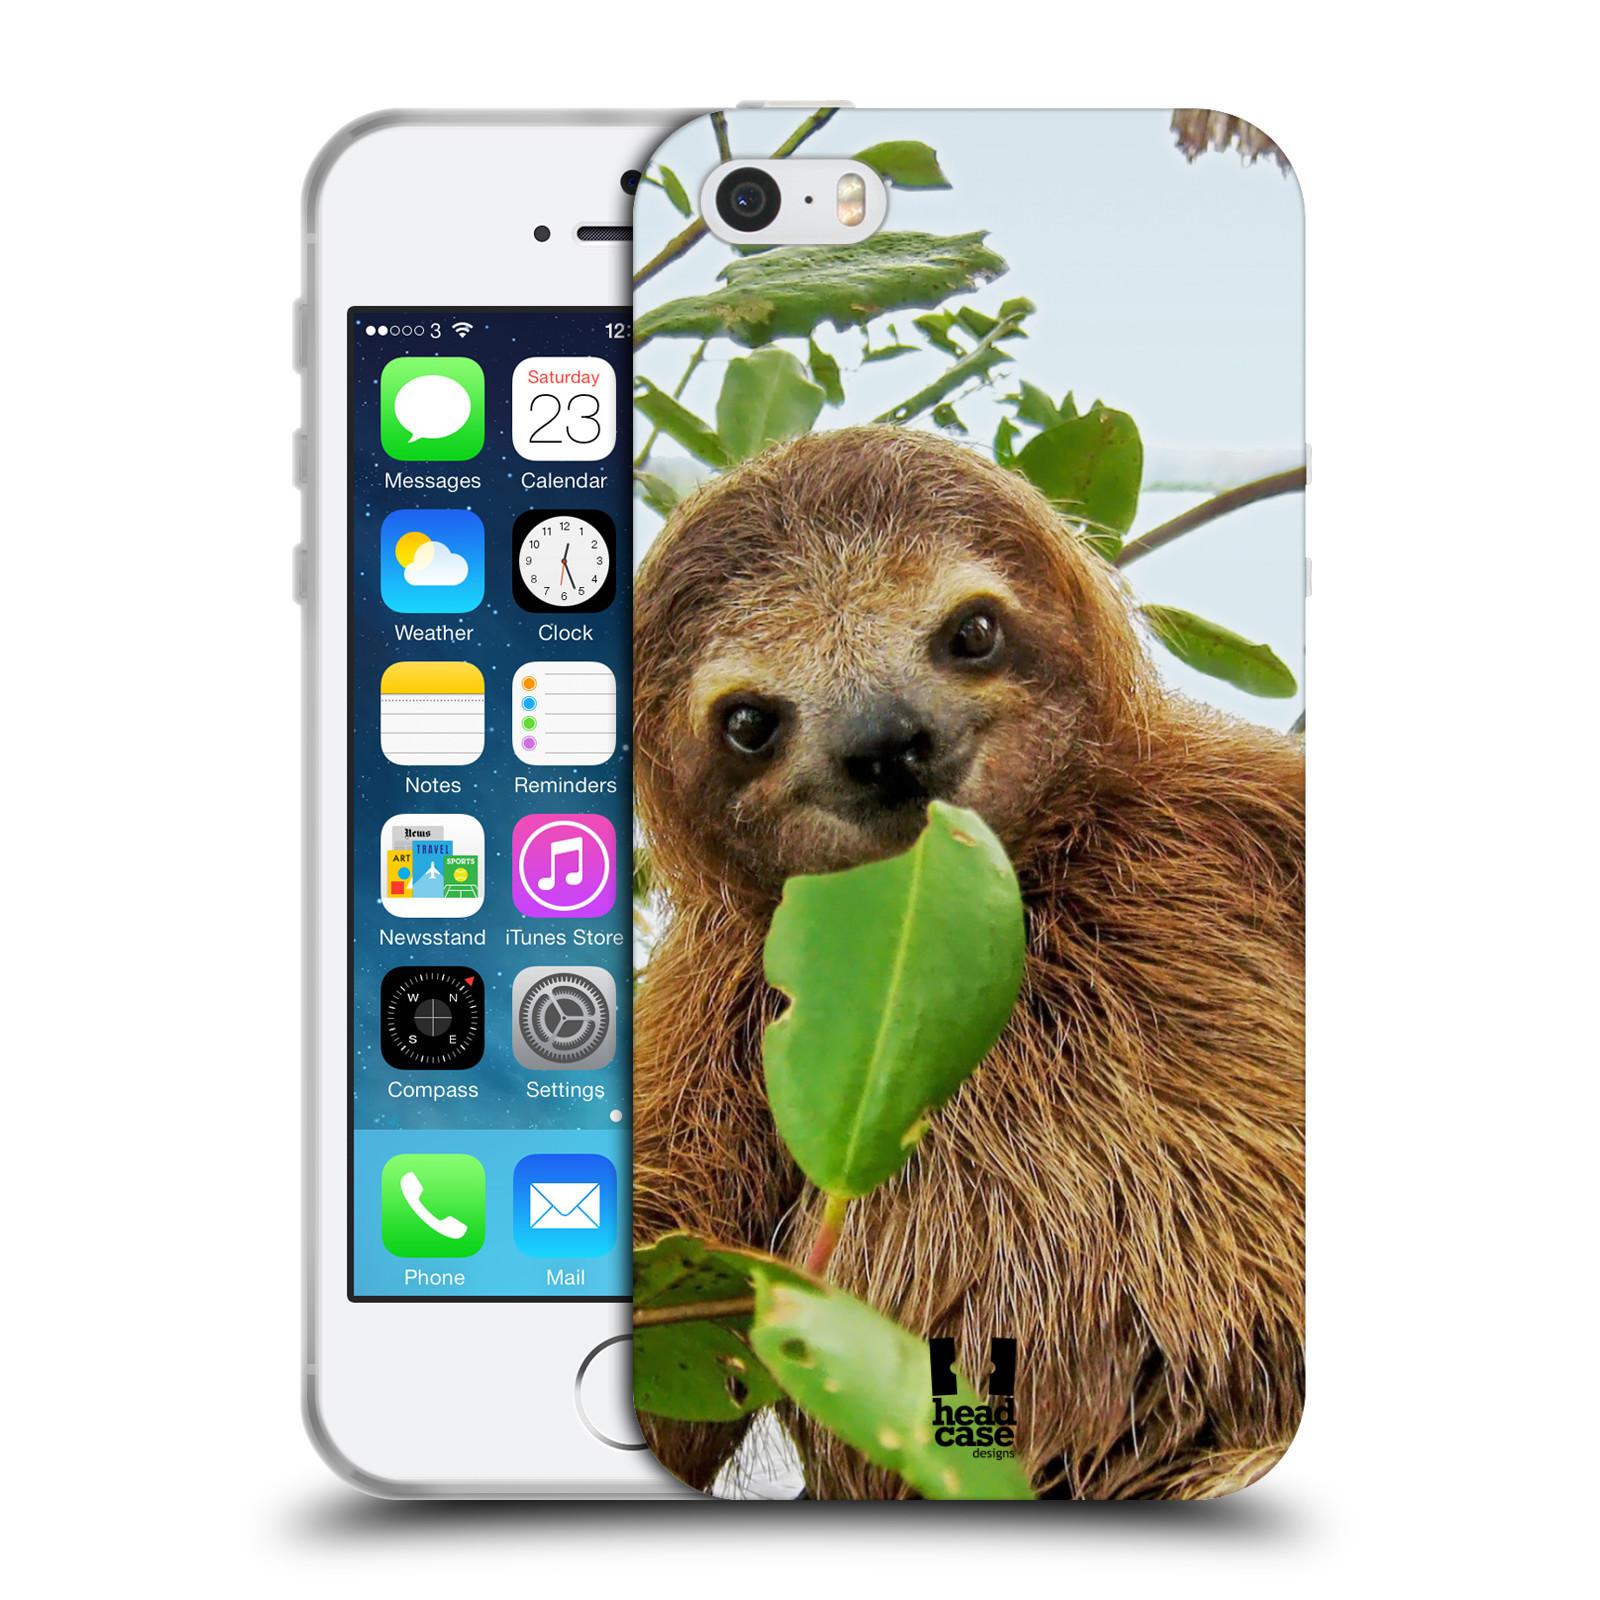 HEAD CASE silikonový obal na mobil Apple Iphone 5/5S vzor slavná zvířata foto lenochod